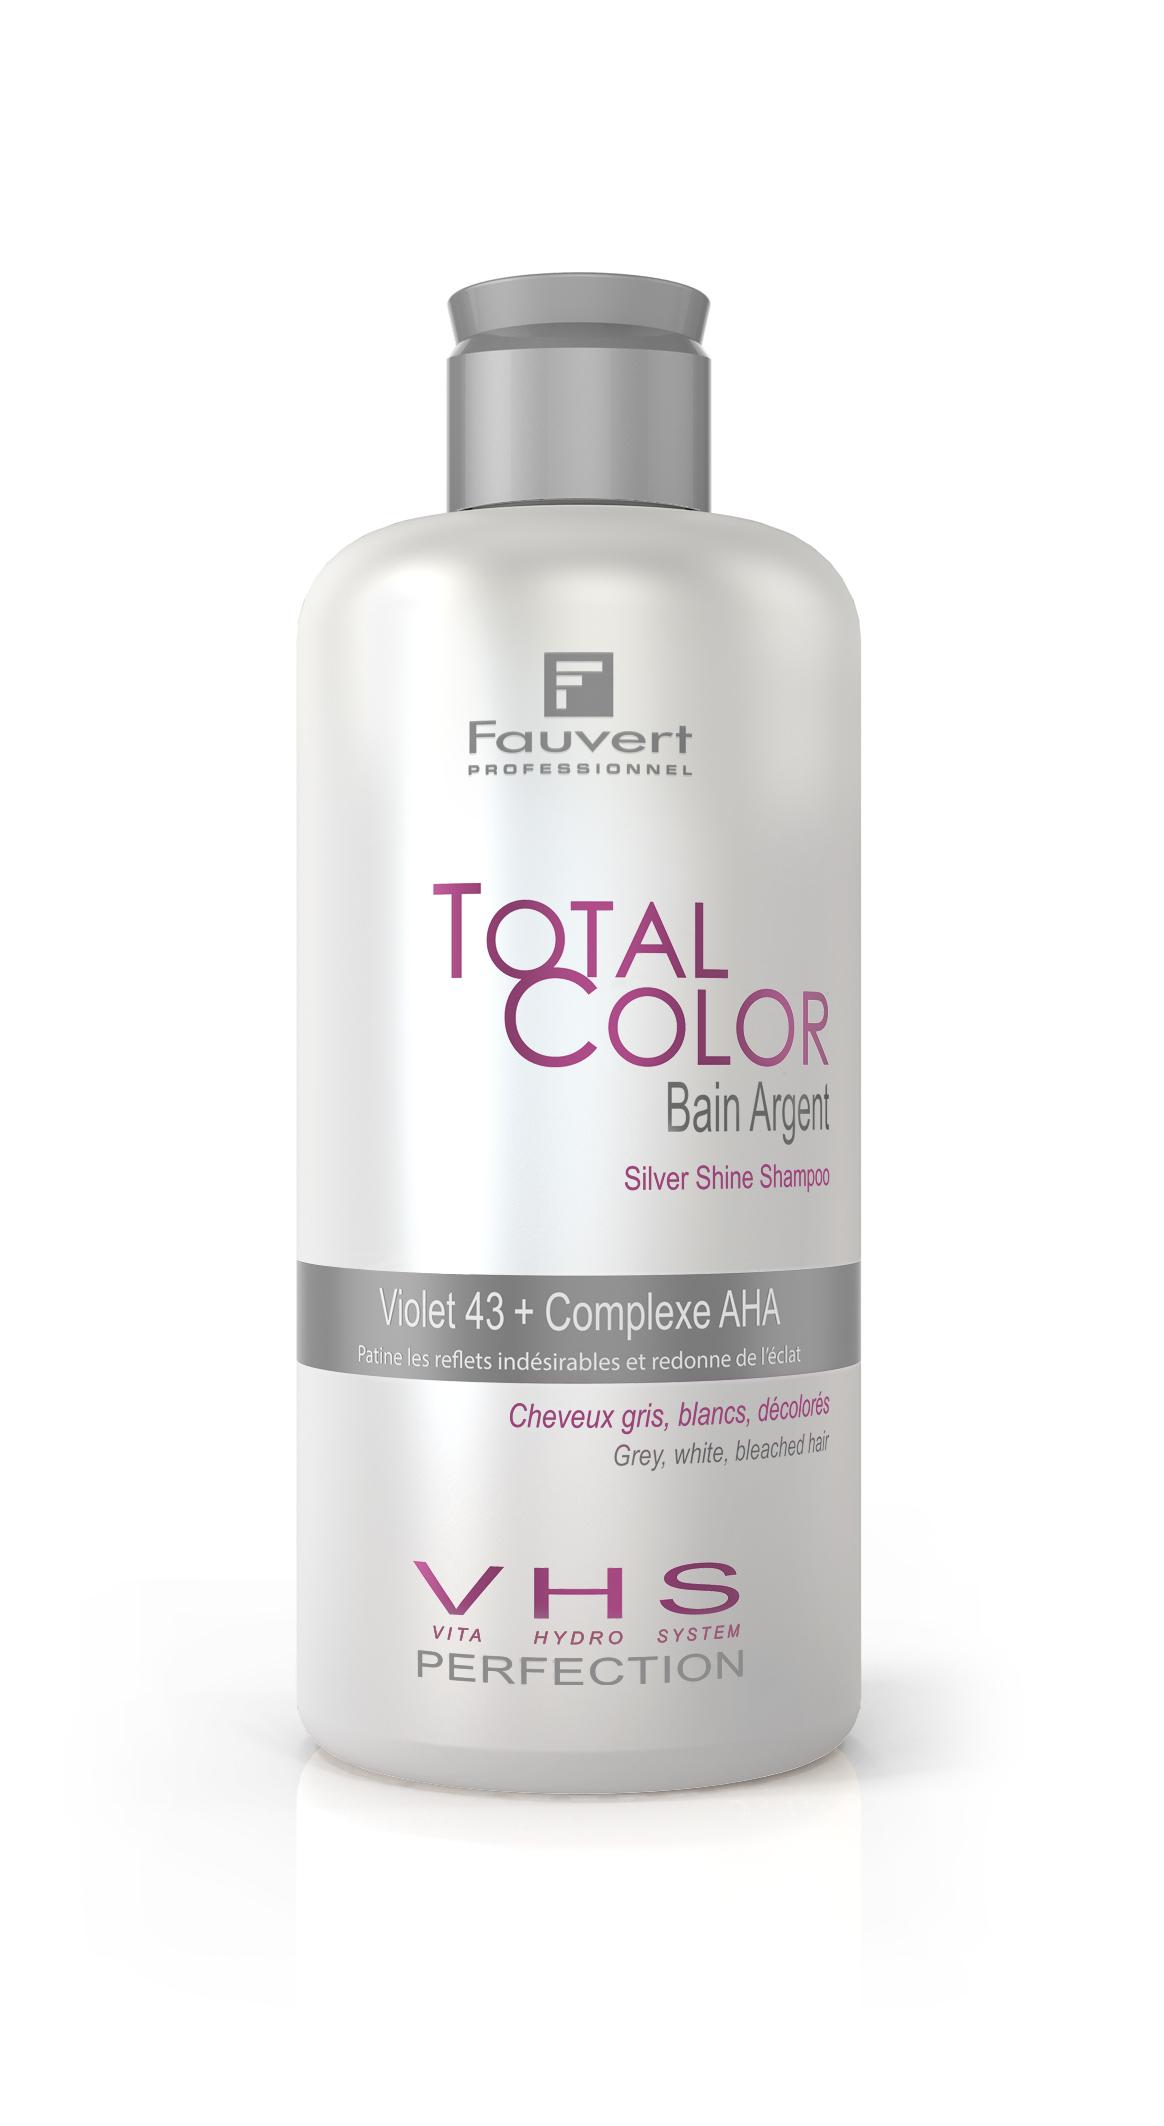 Bain Argent - Silbershampoo - Vita Hydro-System - Total Color - 250ml